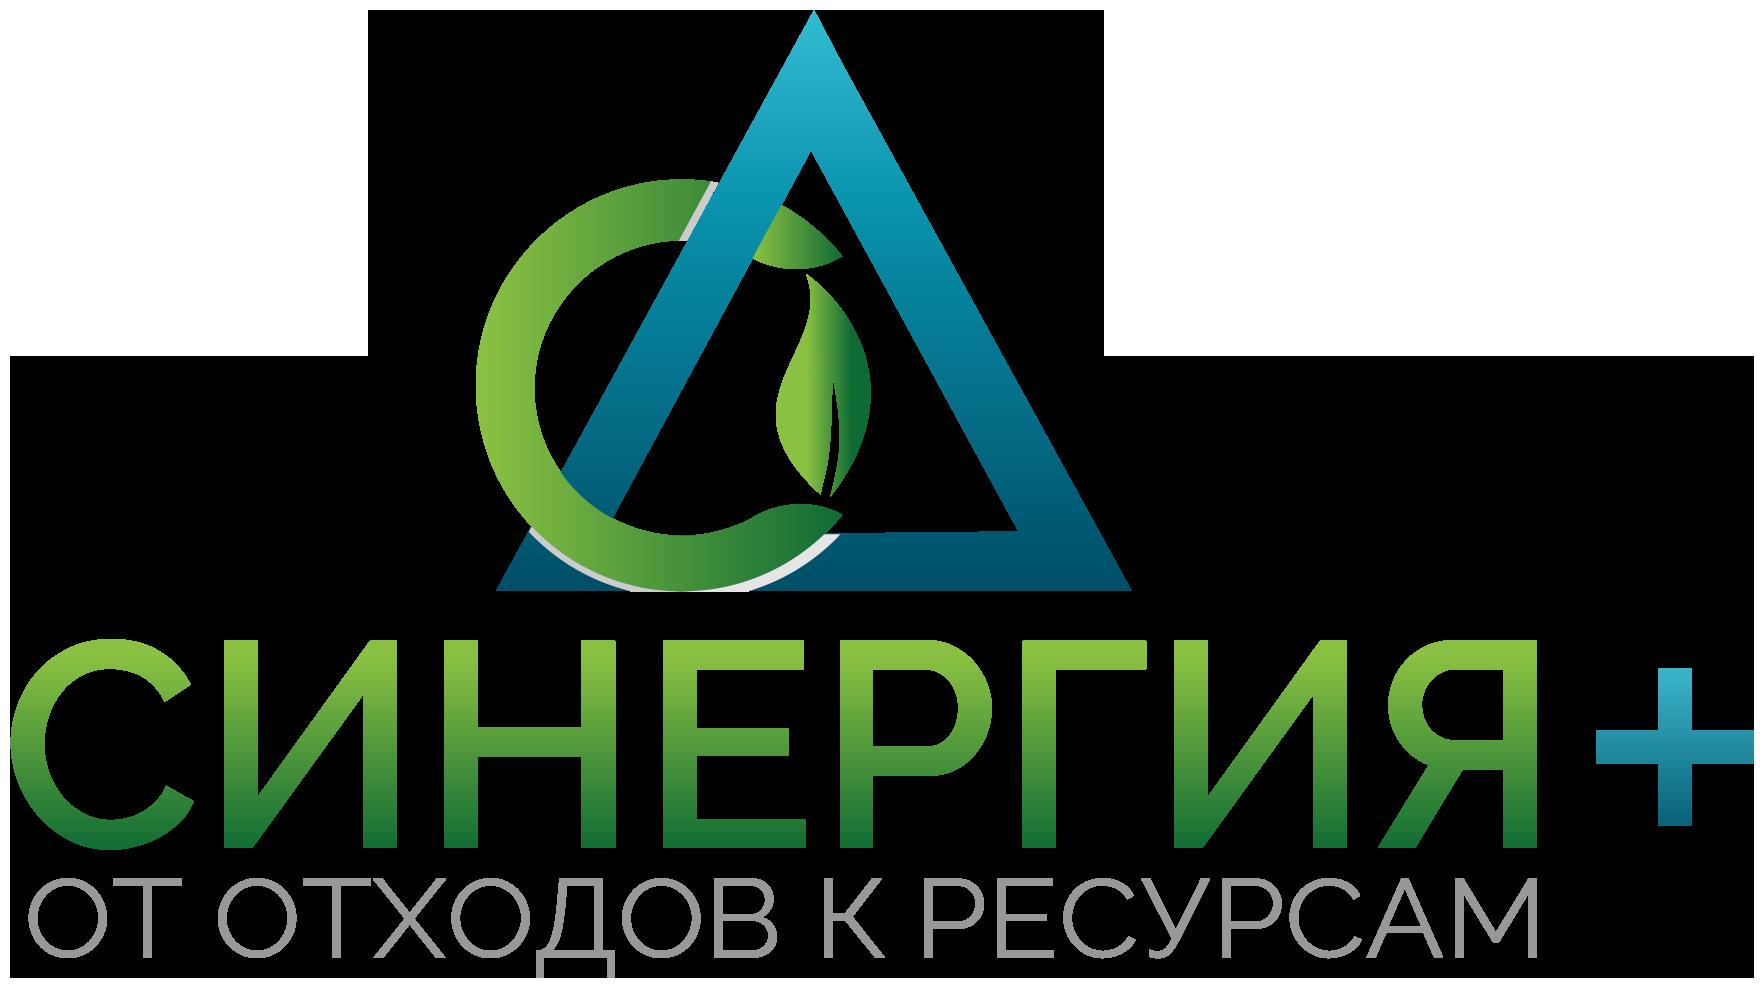 ecosupport.ru